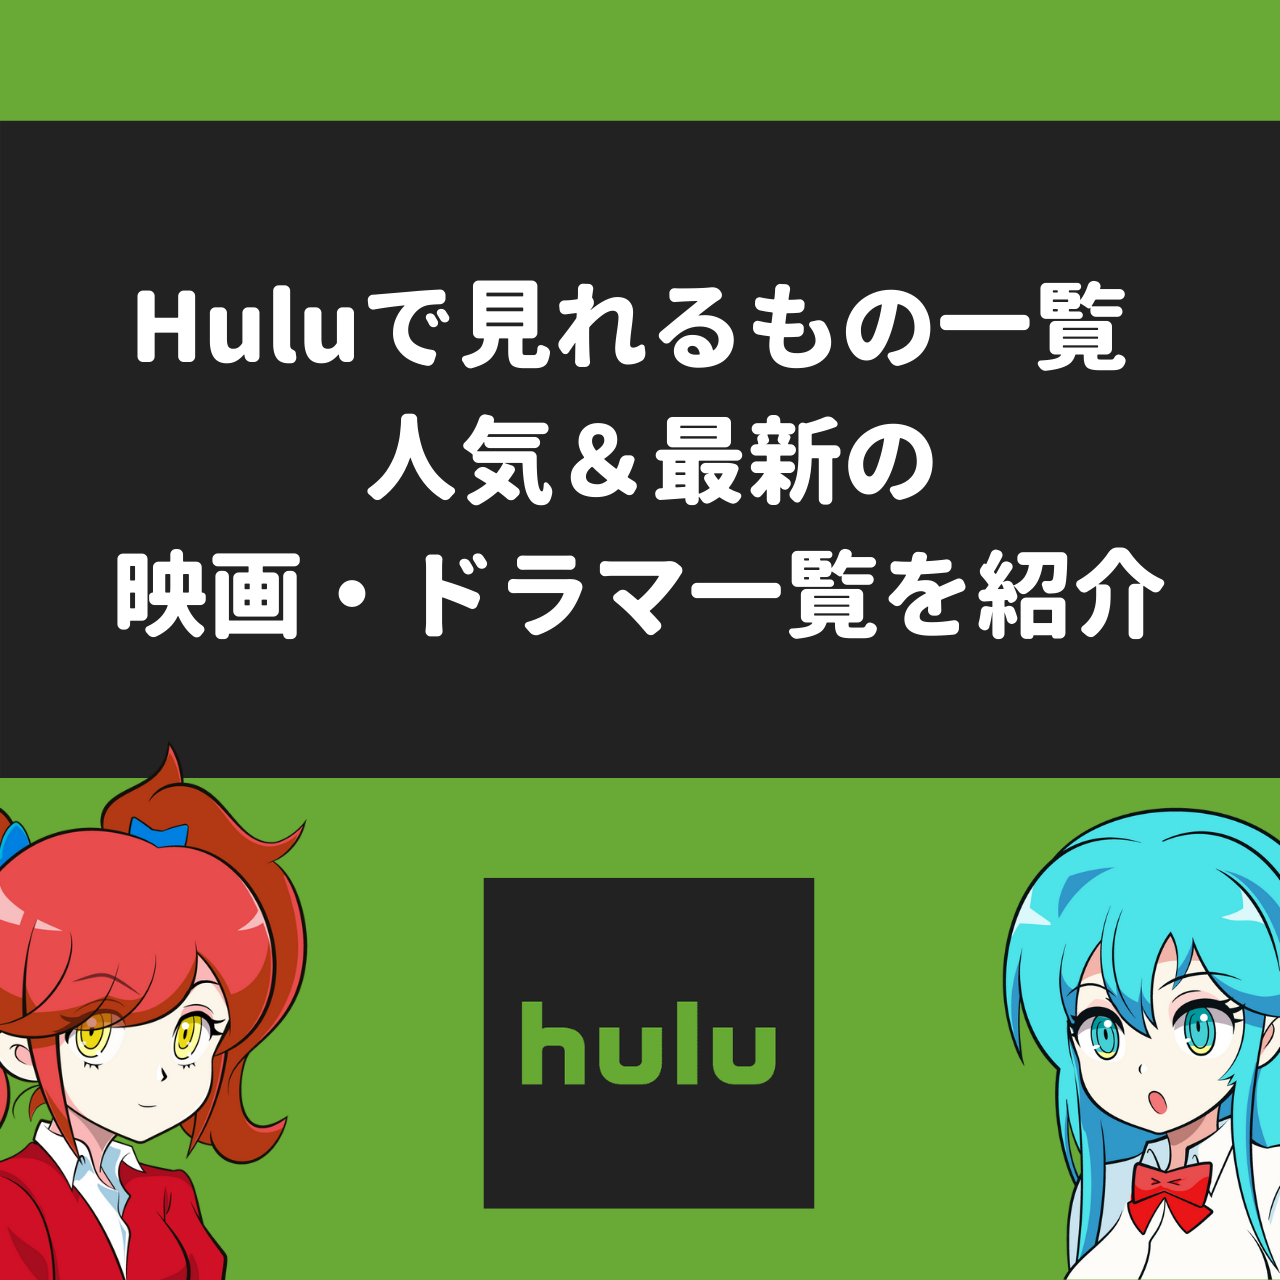 Huluで見れるもの一覧   人気&最新の映画・ドラマ一覧を紹介